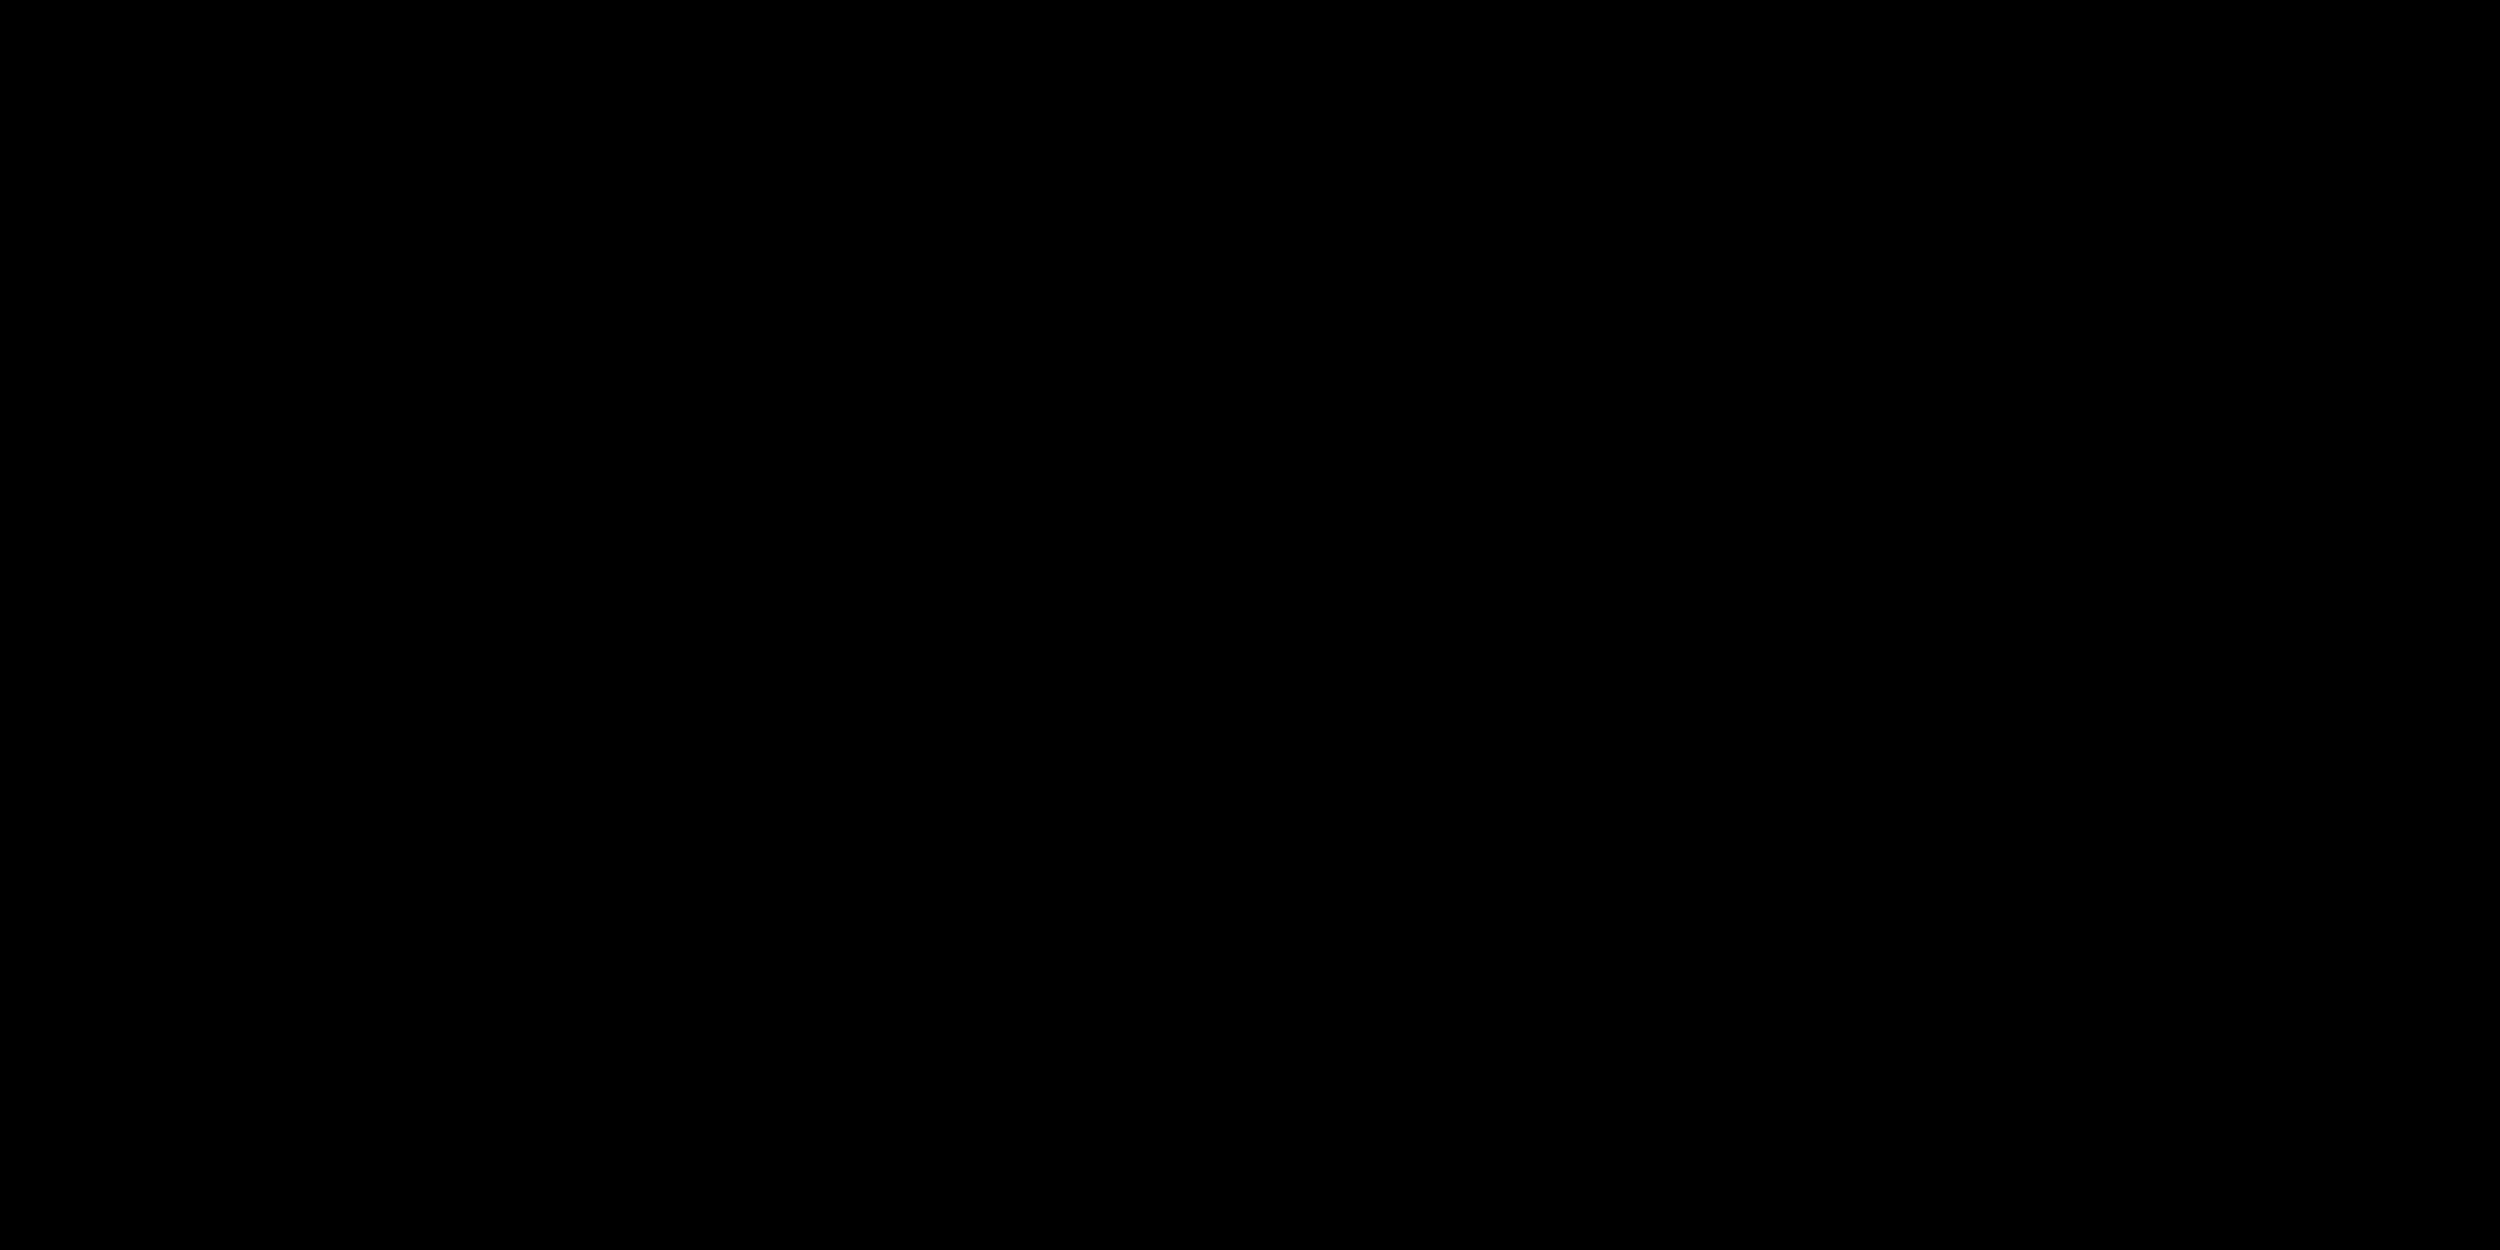 Uuiuntitled-2.jpg